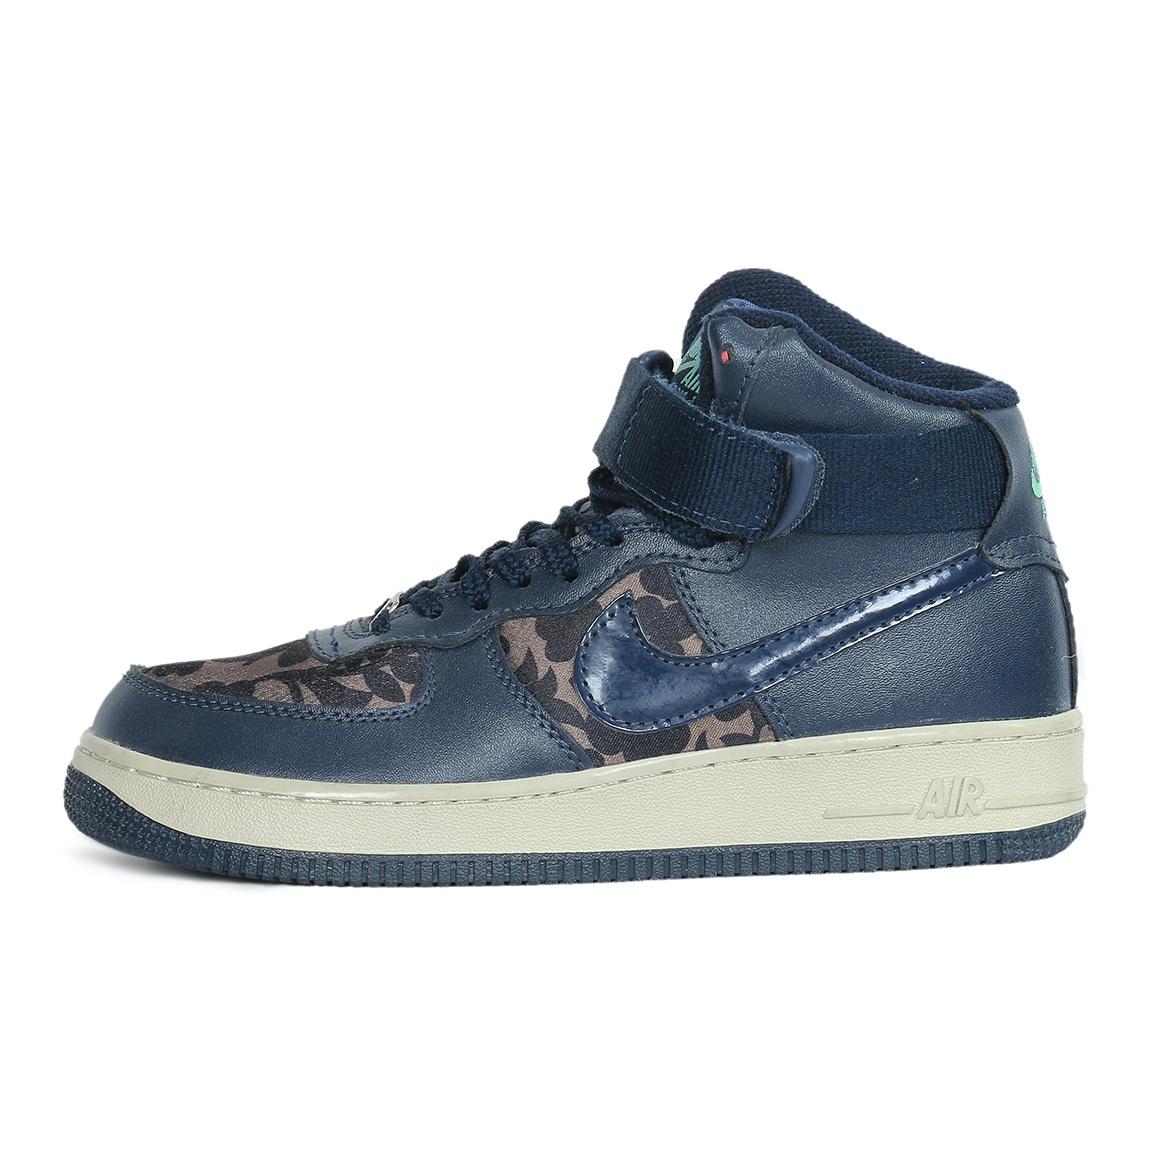 کفش راحتی زنانه نایکی مدل nike air کد 300-706653